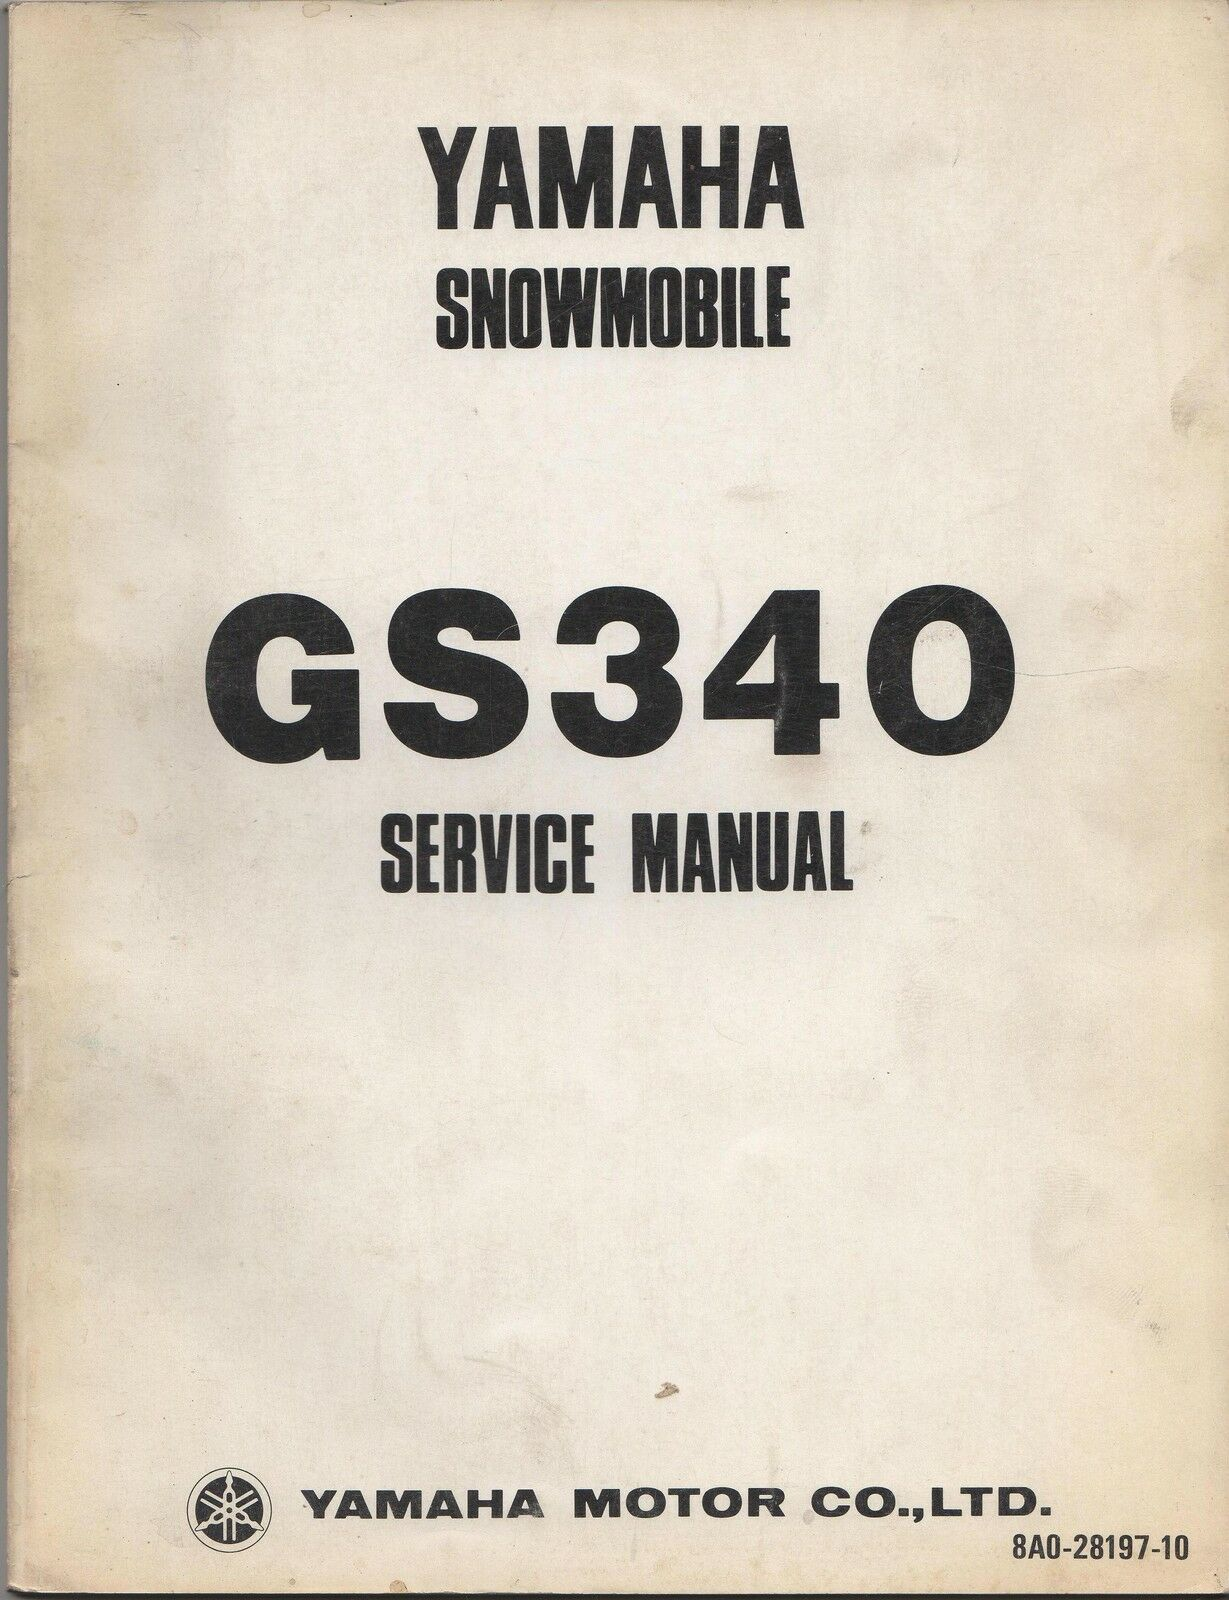 1976 YAMAHA SNOWMOBILE GS340 SERVICE MANUAL